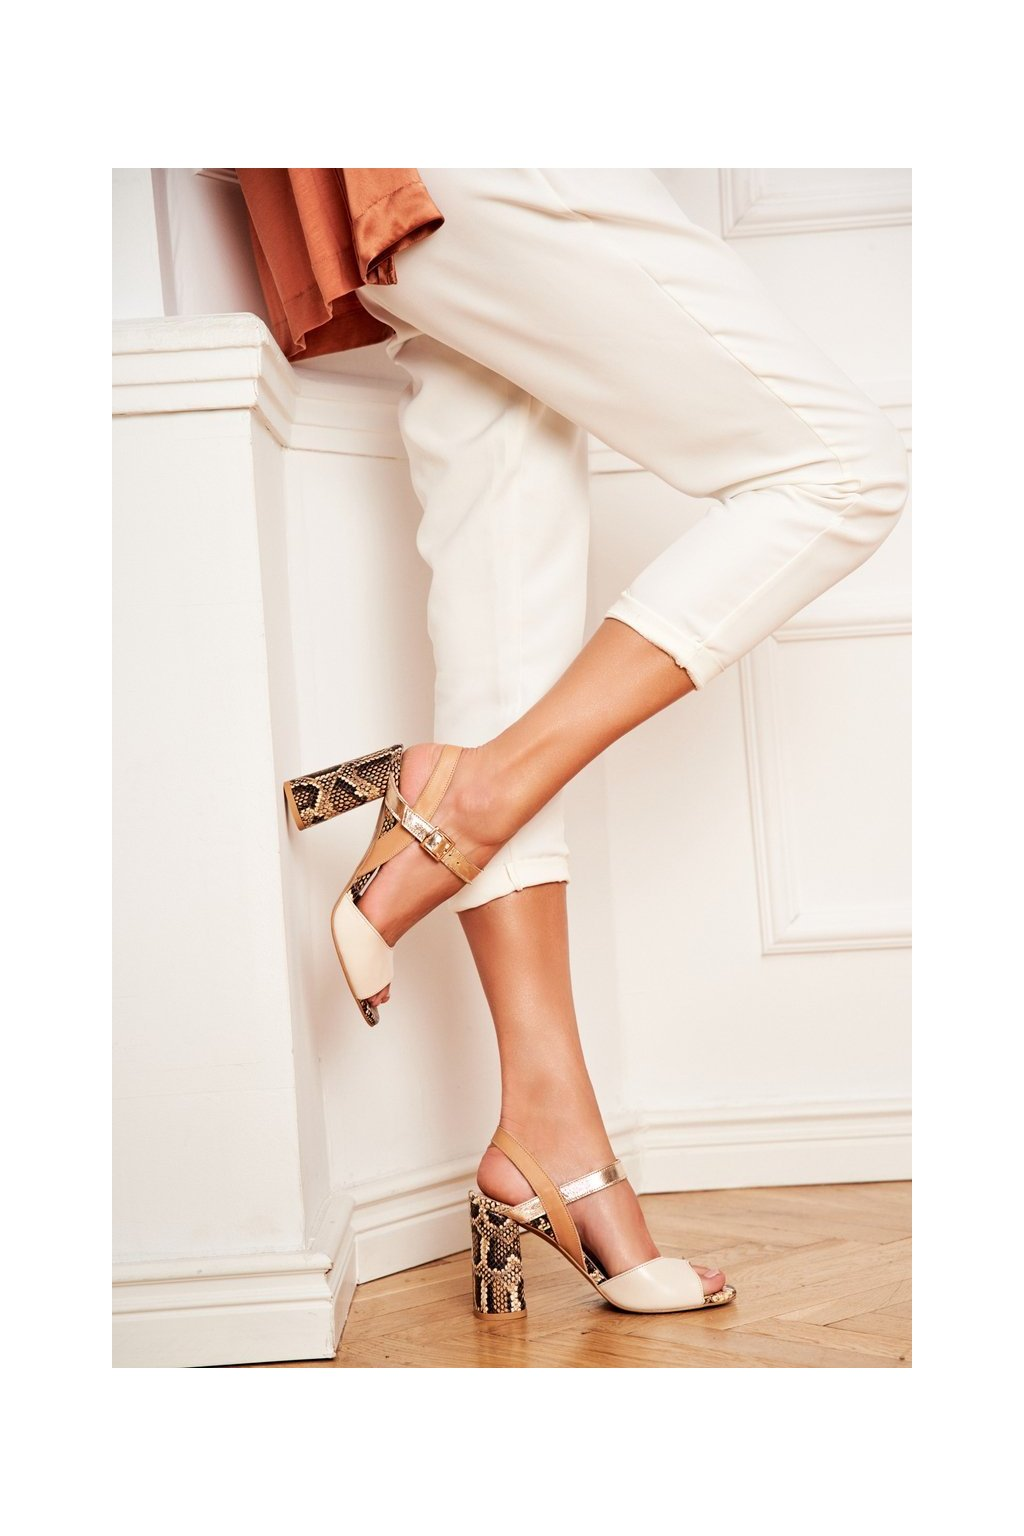 Dámske sandále na podpätku farba hnedá kód obuvi 2136 184-288-227 BEIGE